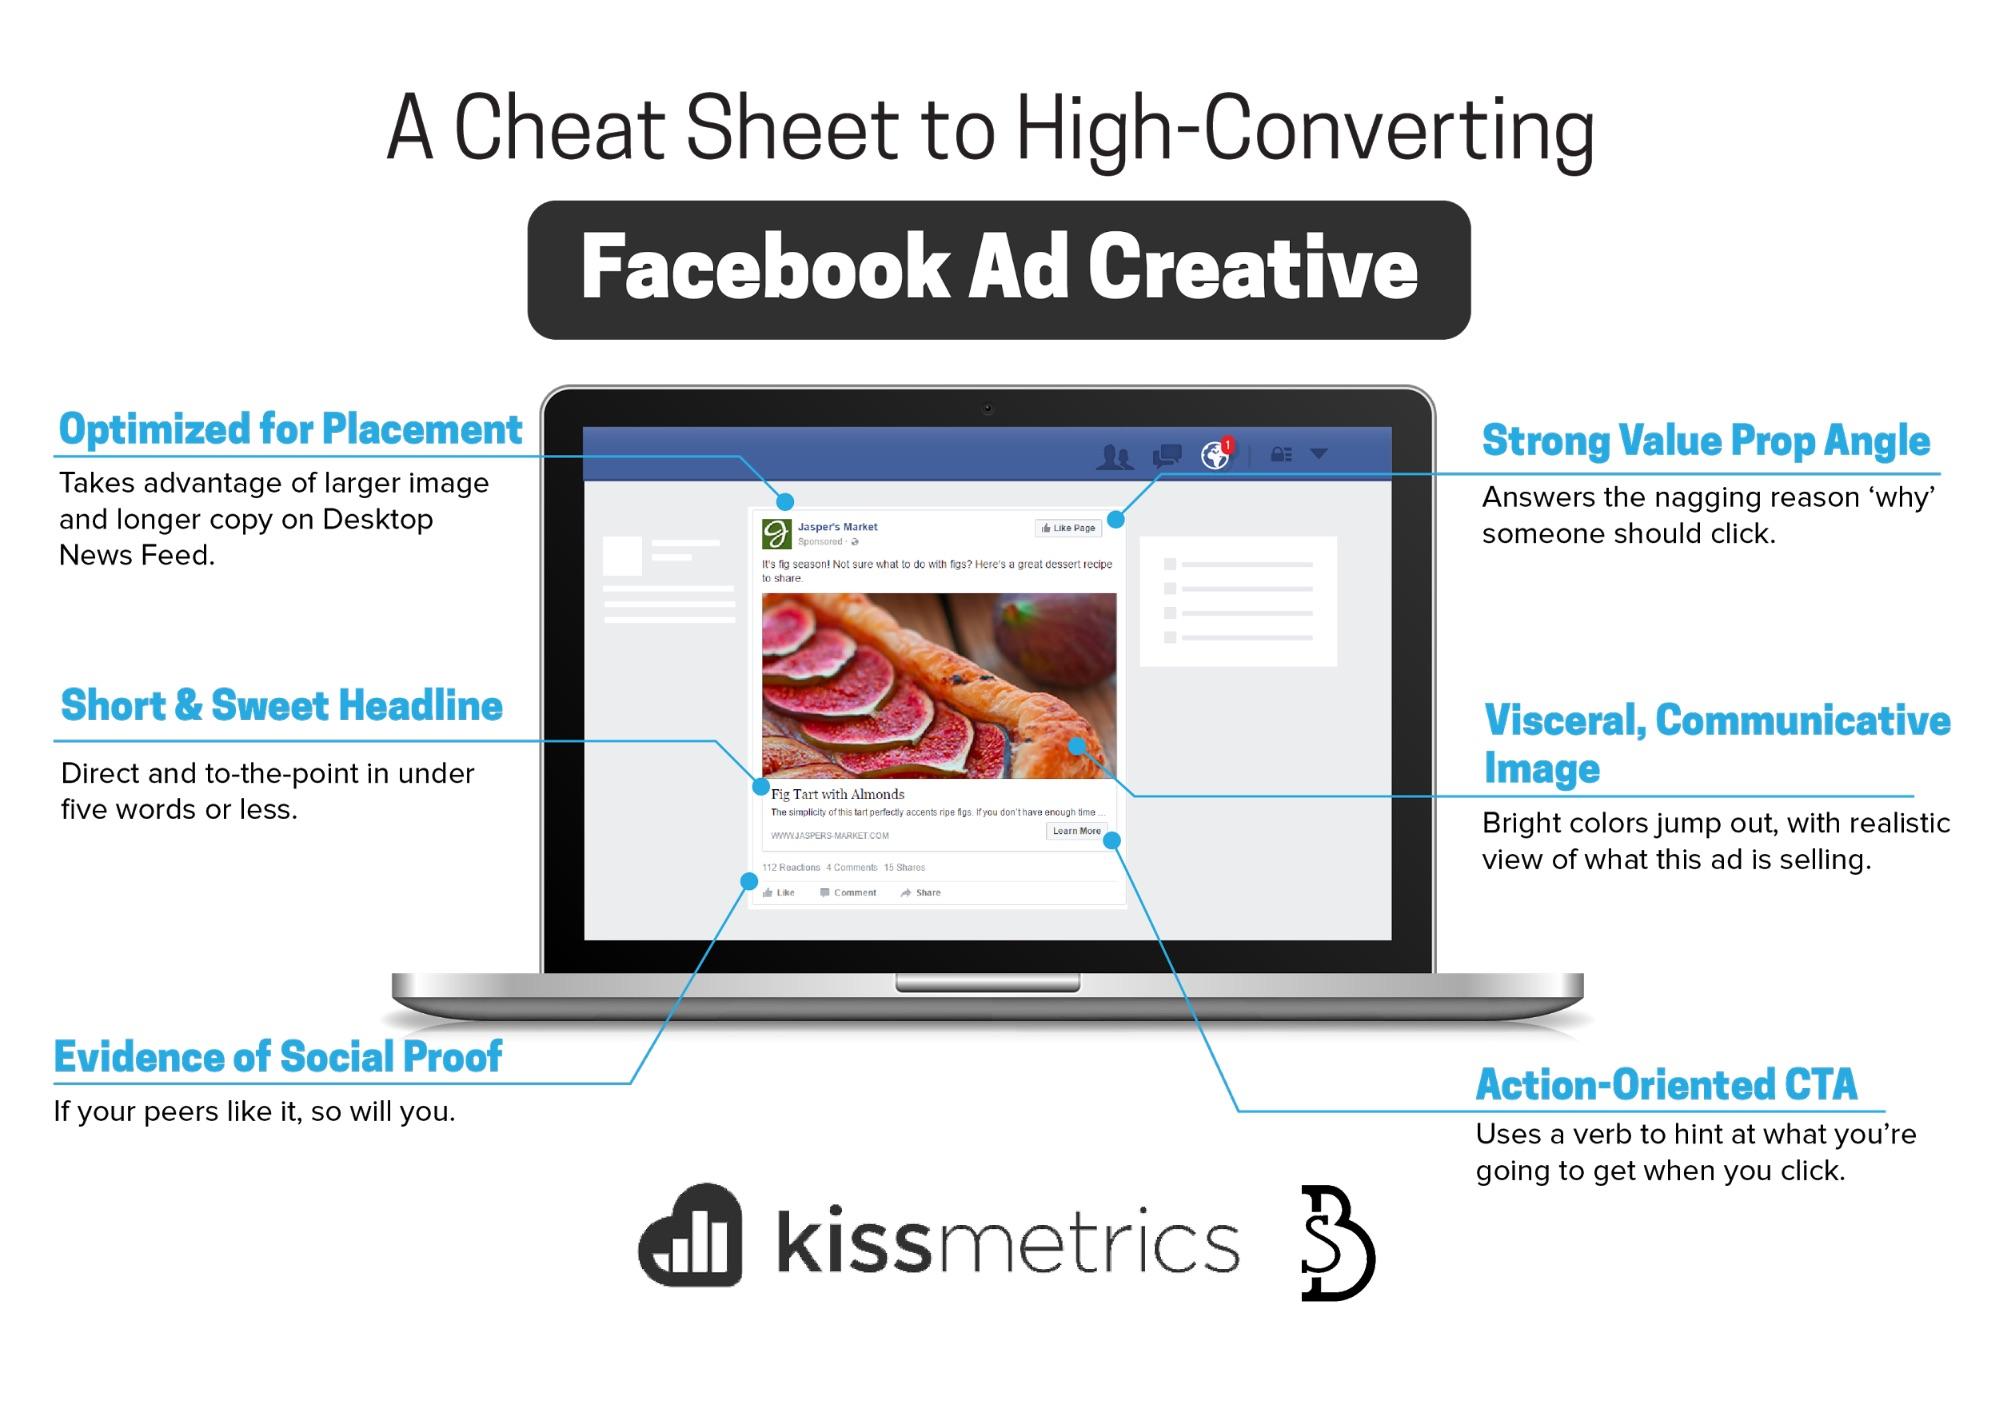 A Cheat Sheet To High Converting Facebook Ad Creative